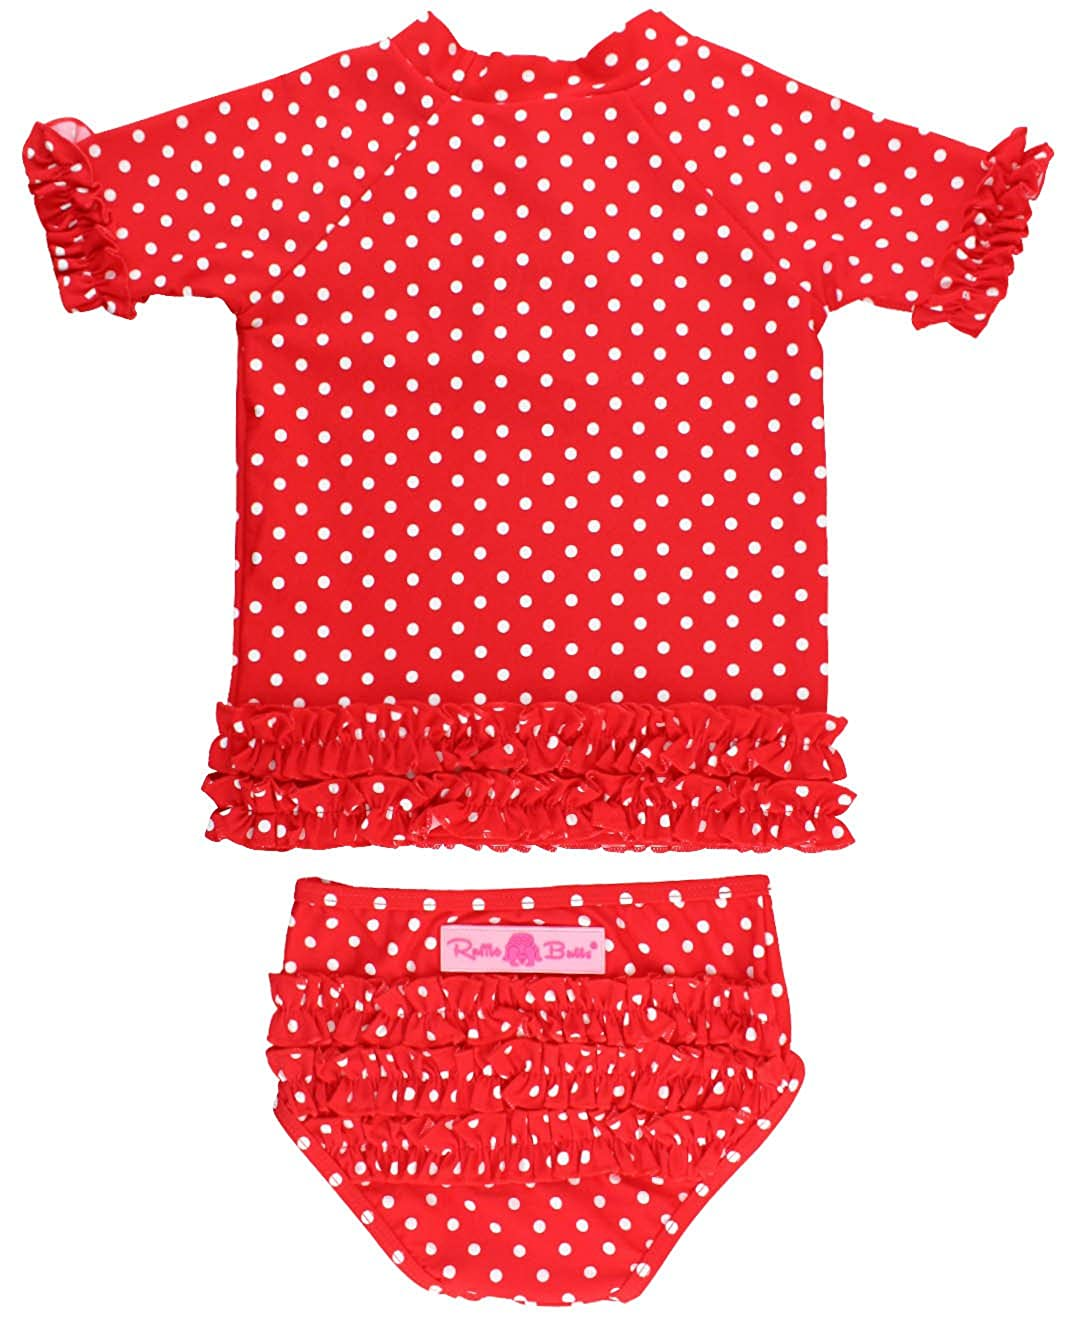 RuffleButts Baby/Toddler Girls Rash Guard Short Sleeve 2-Piece Swimsuit Set - Polka Dot Bikini with UPF 50+ Sun Protection RGSYYXX-SSPD-SC-BABY